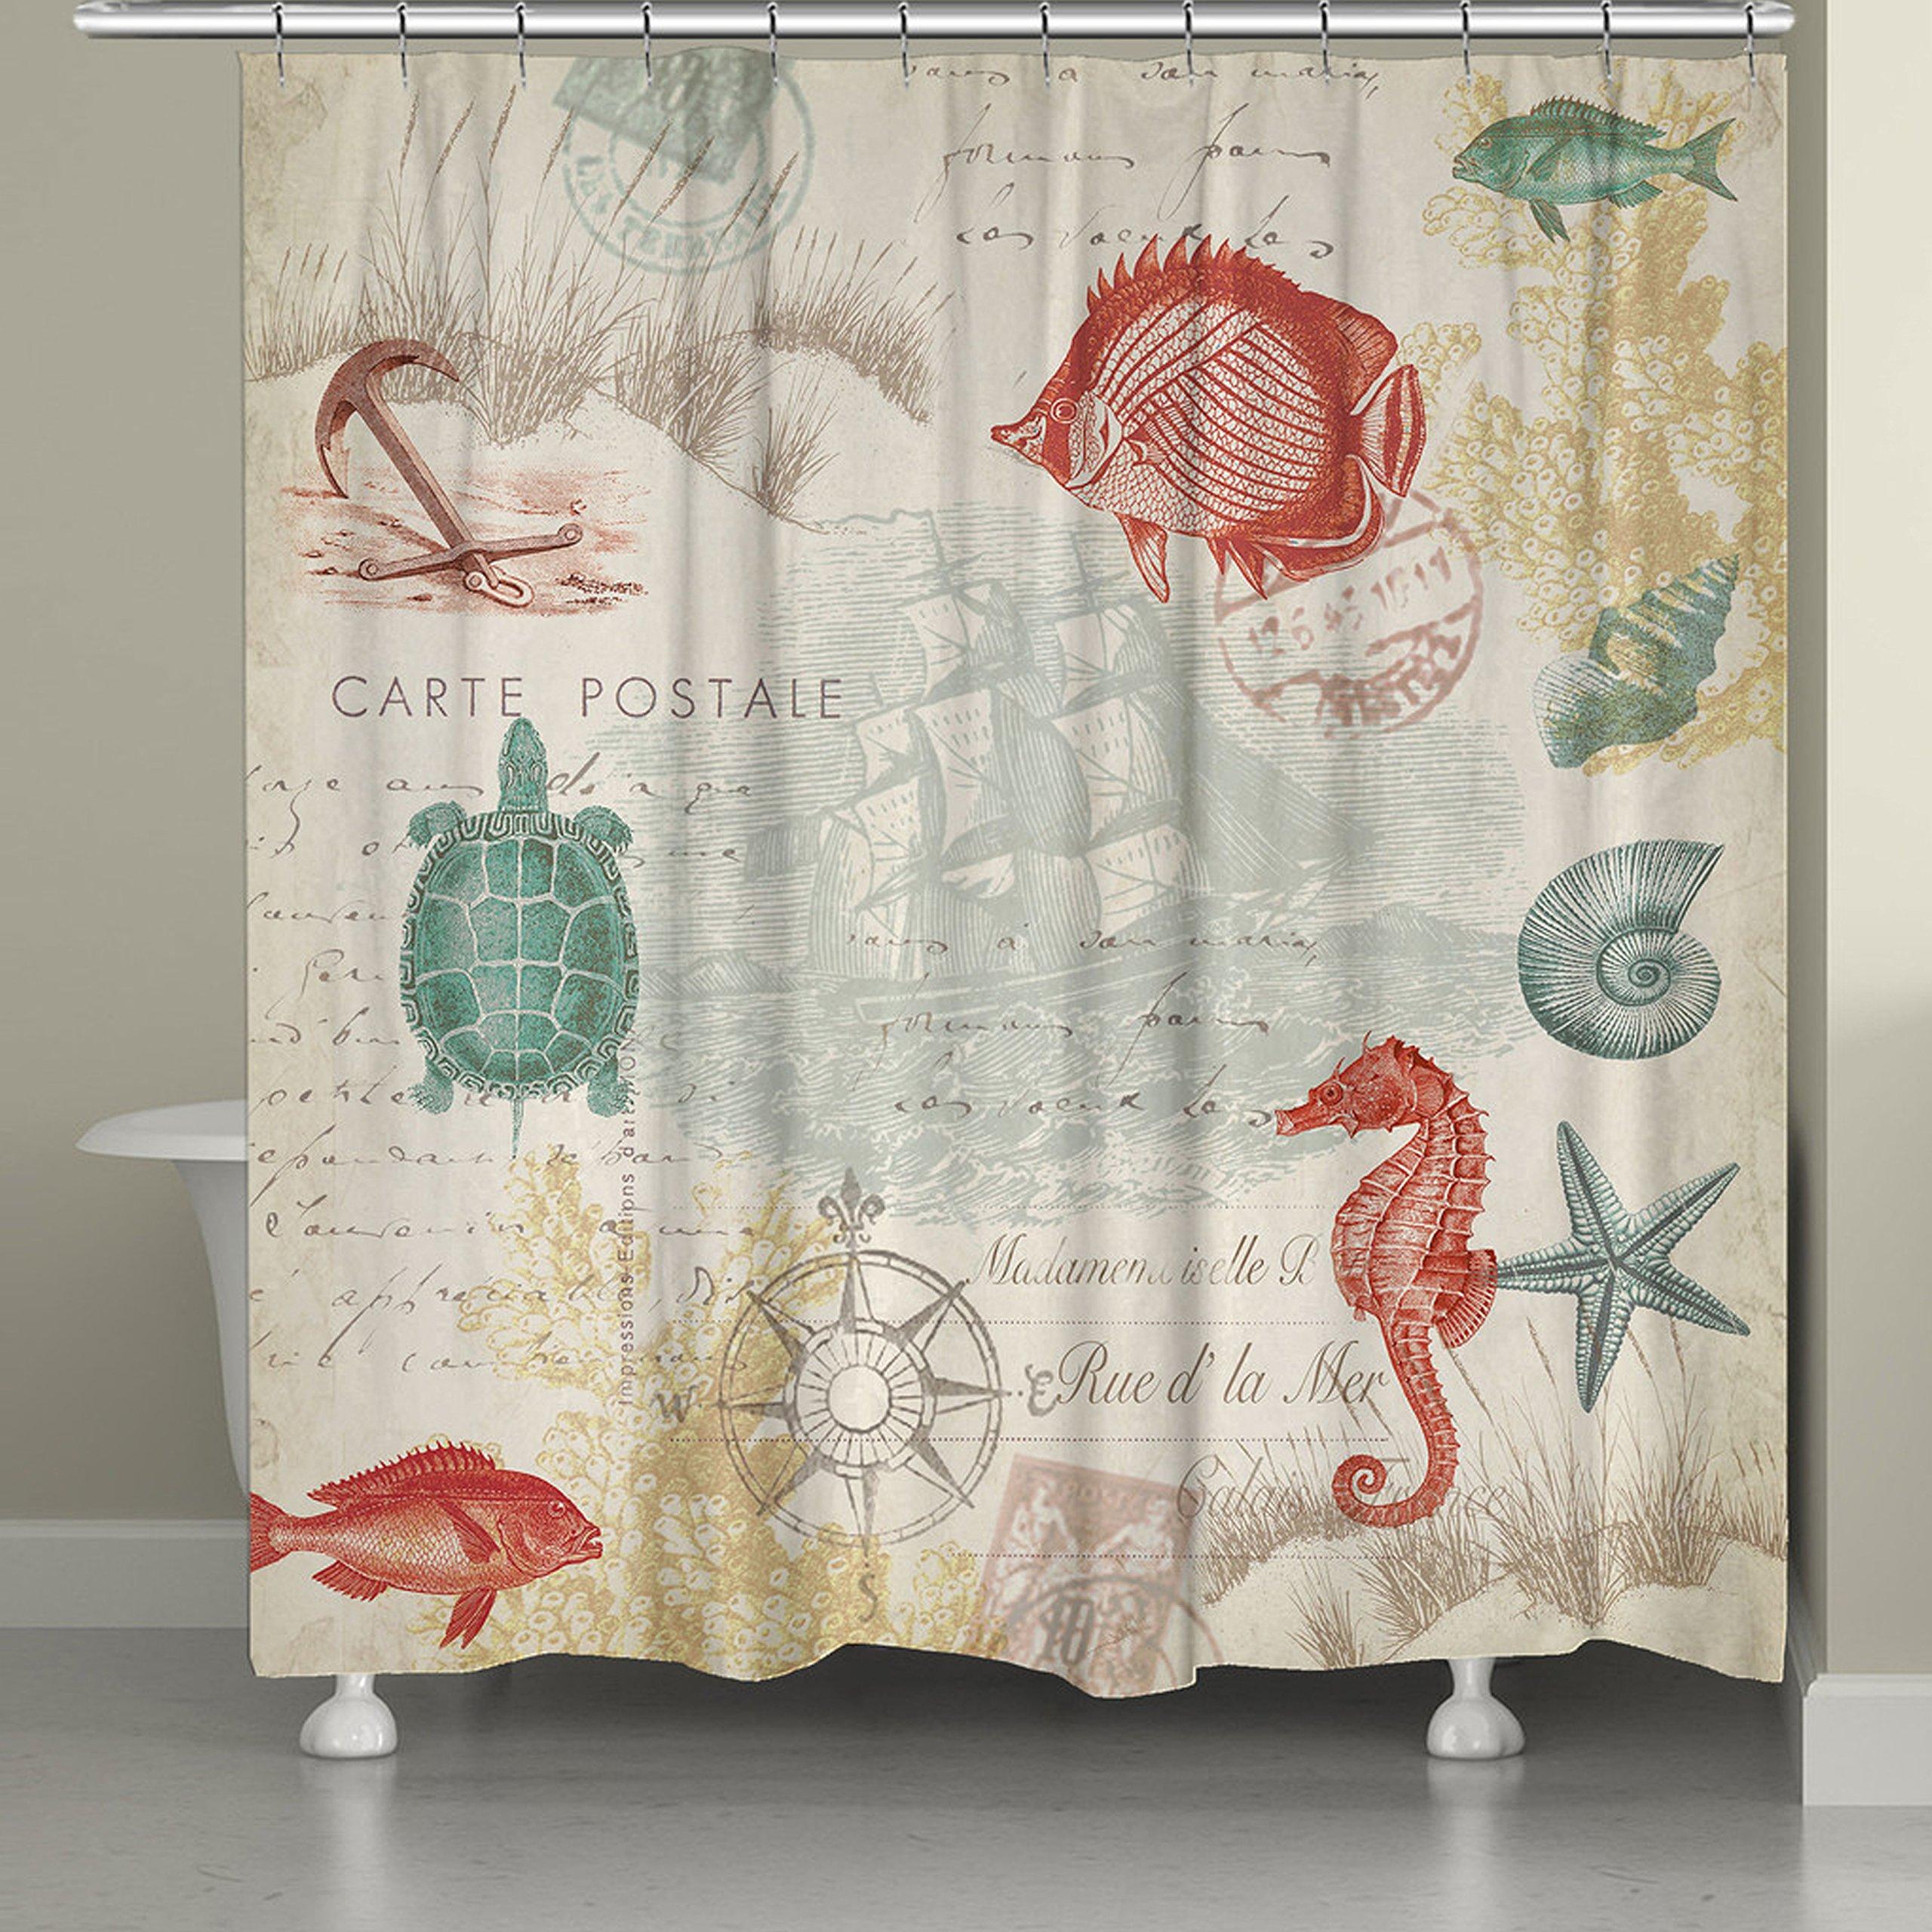 1 Piece Girls 71''x74'' Beach Maritime Themed Shower Curtain, Ocean Pattern Starfish Shells Seahorse Pattern, Vintage Adventurer Seascape Pirate Boat Anchor Seaside Art Print Print, Abstract Colors